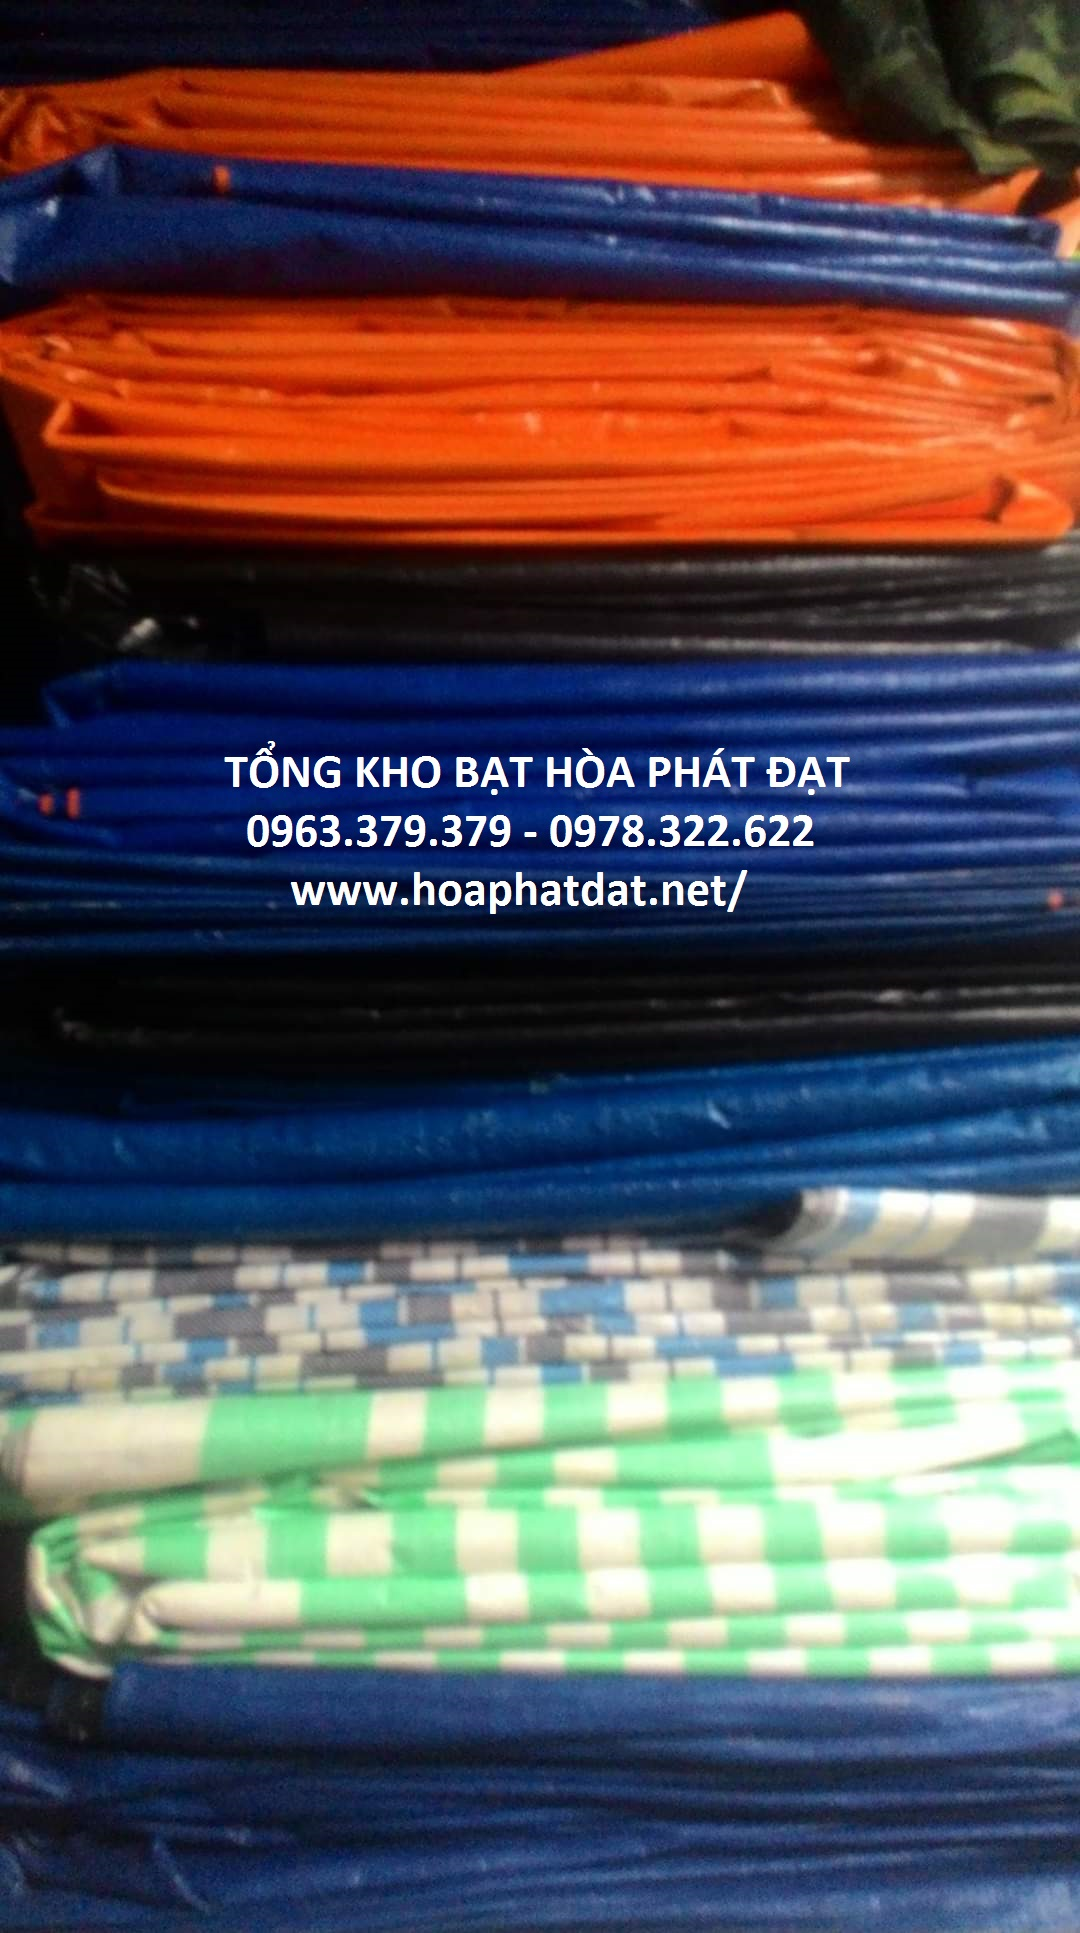 Bạt nhua 2 da han quoc chinh hang hoa phat dat